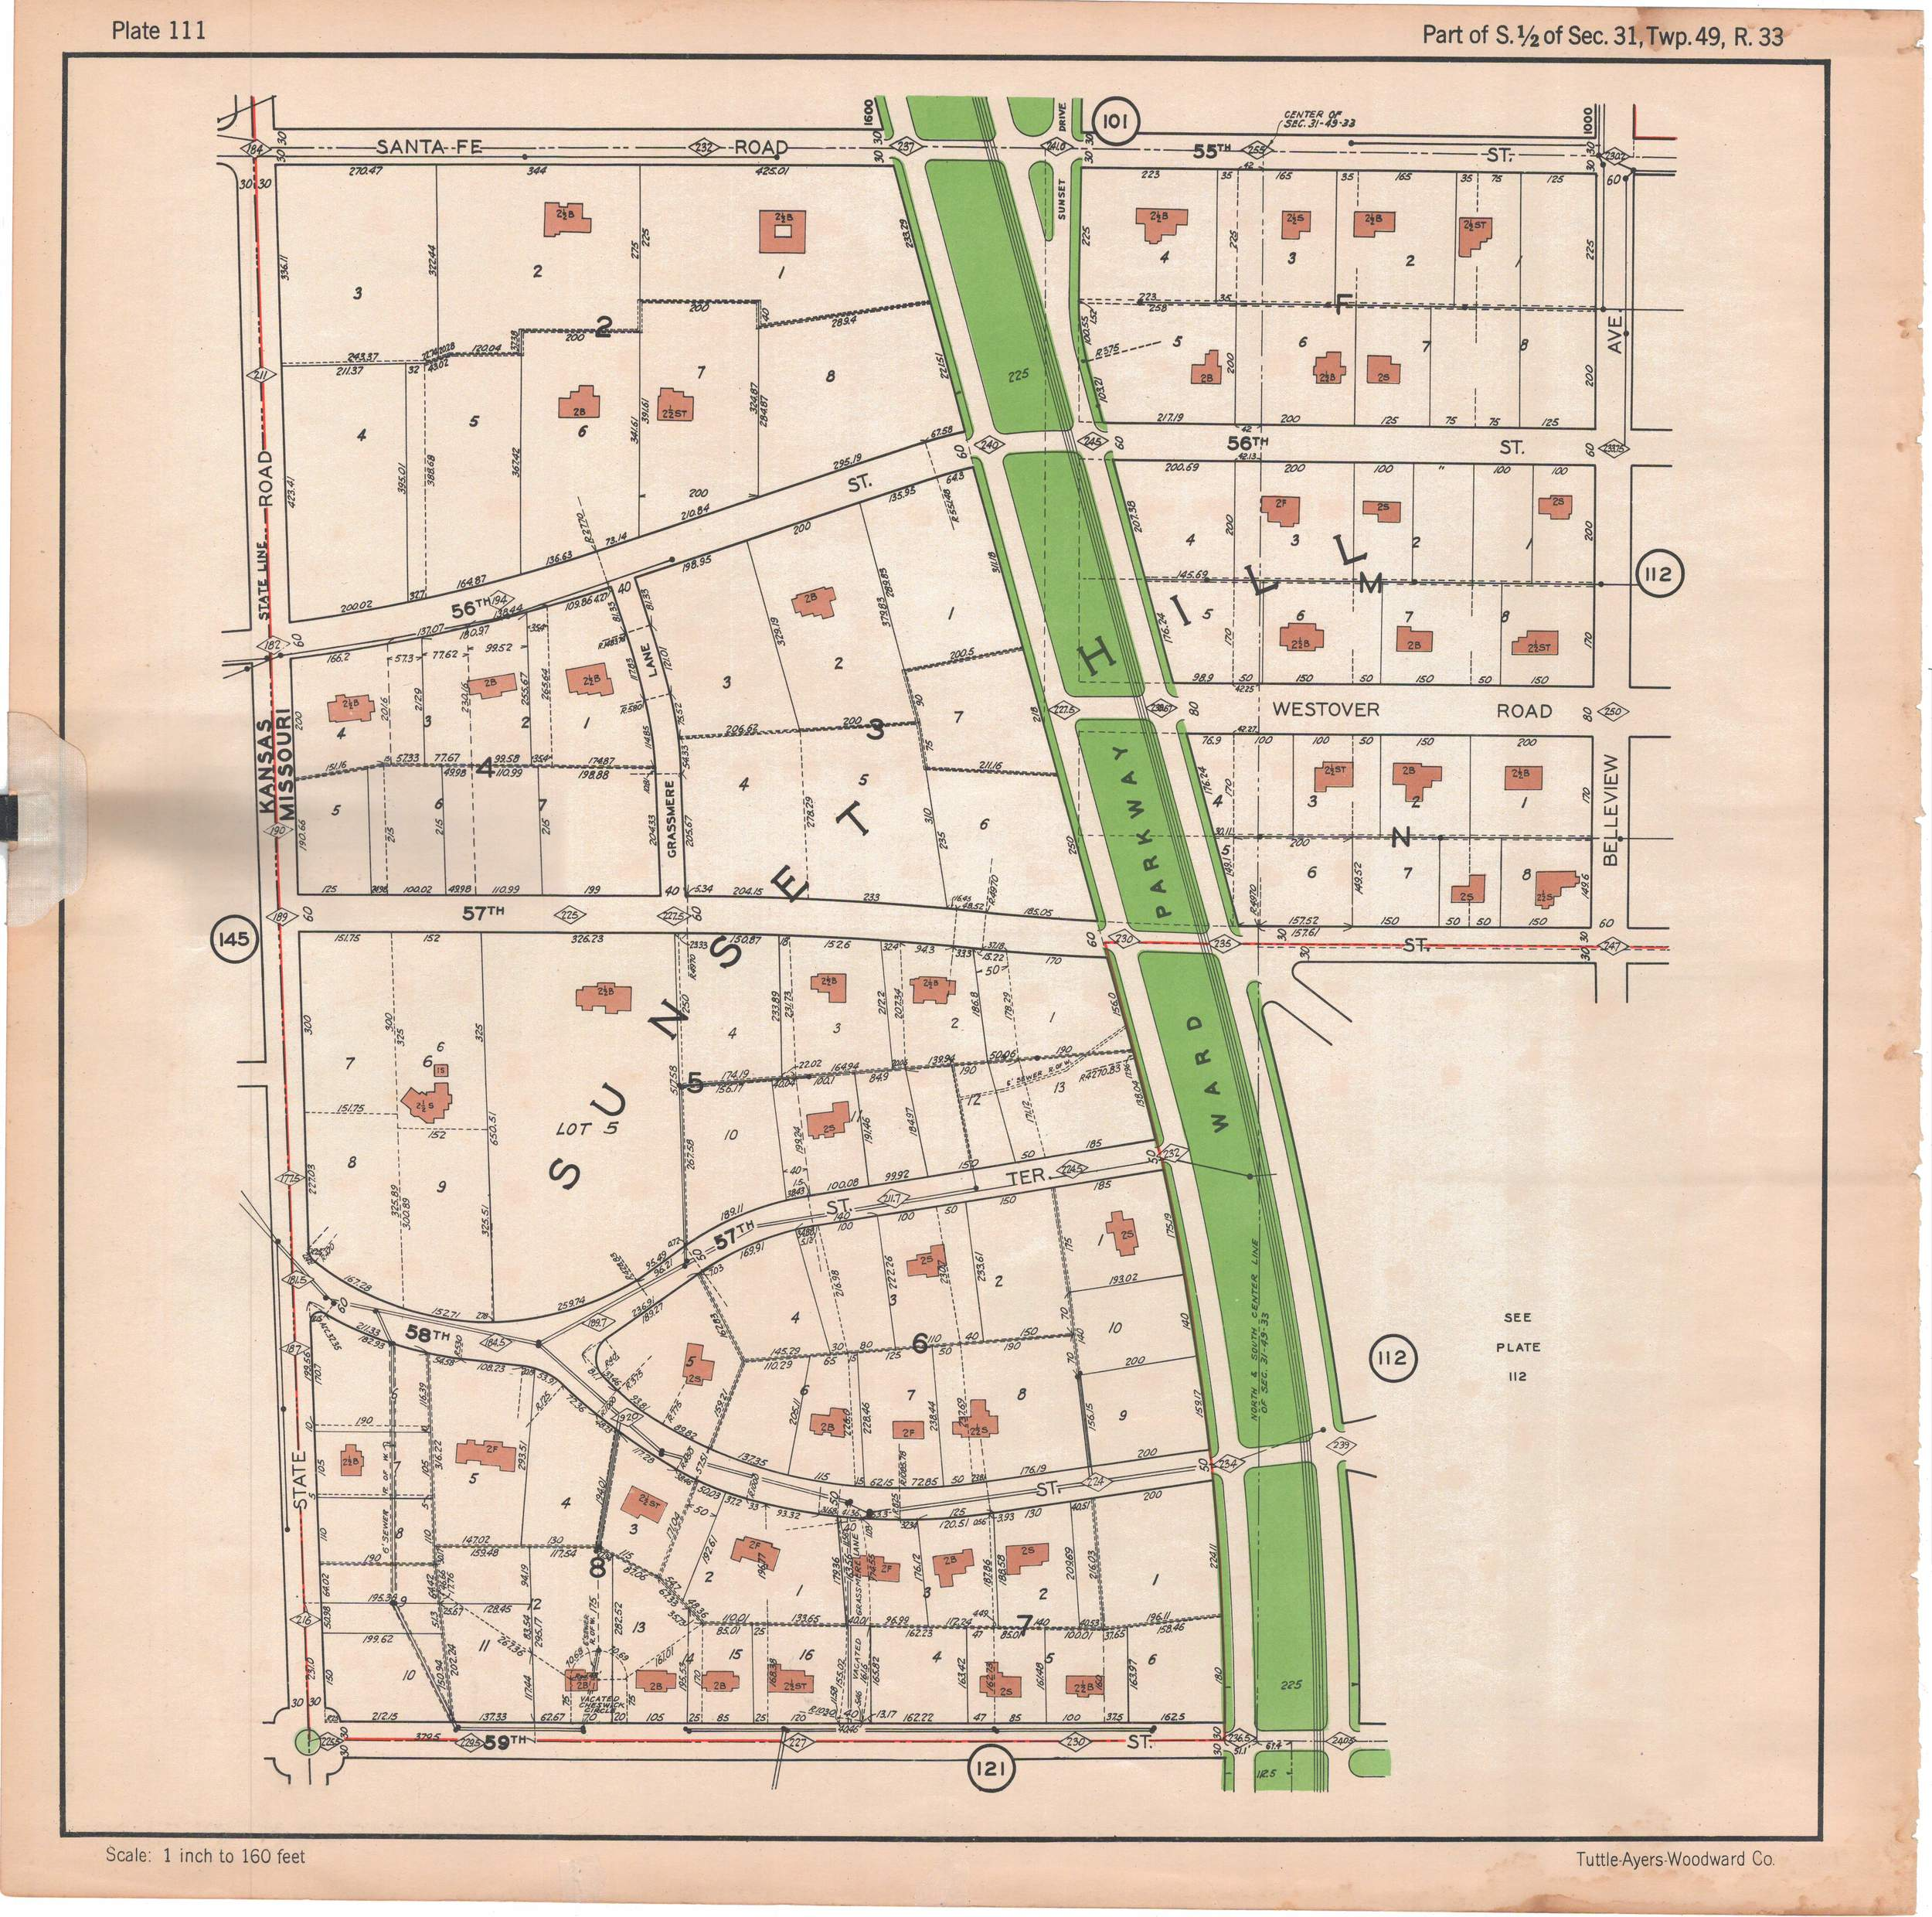 1925 TUTTLE_AYERS_Plate 111.JPG